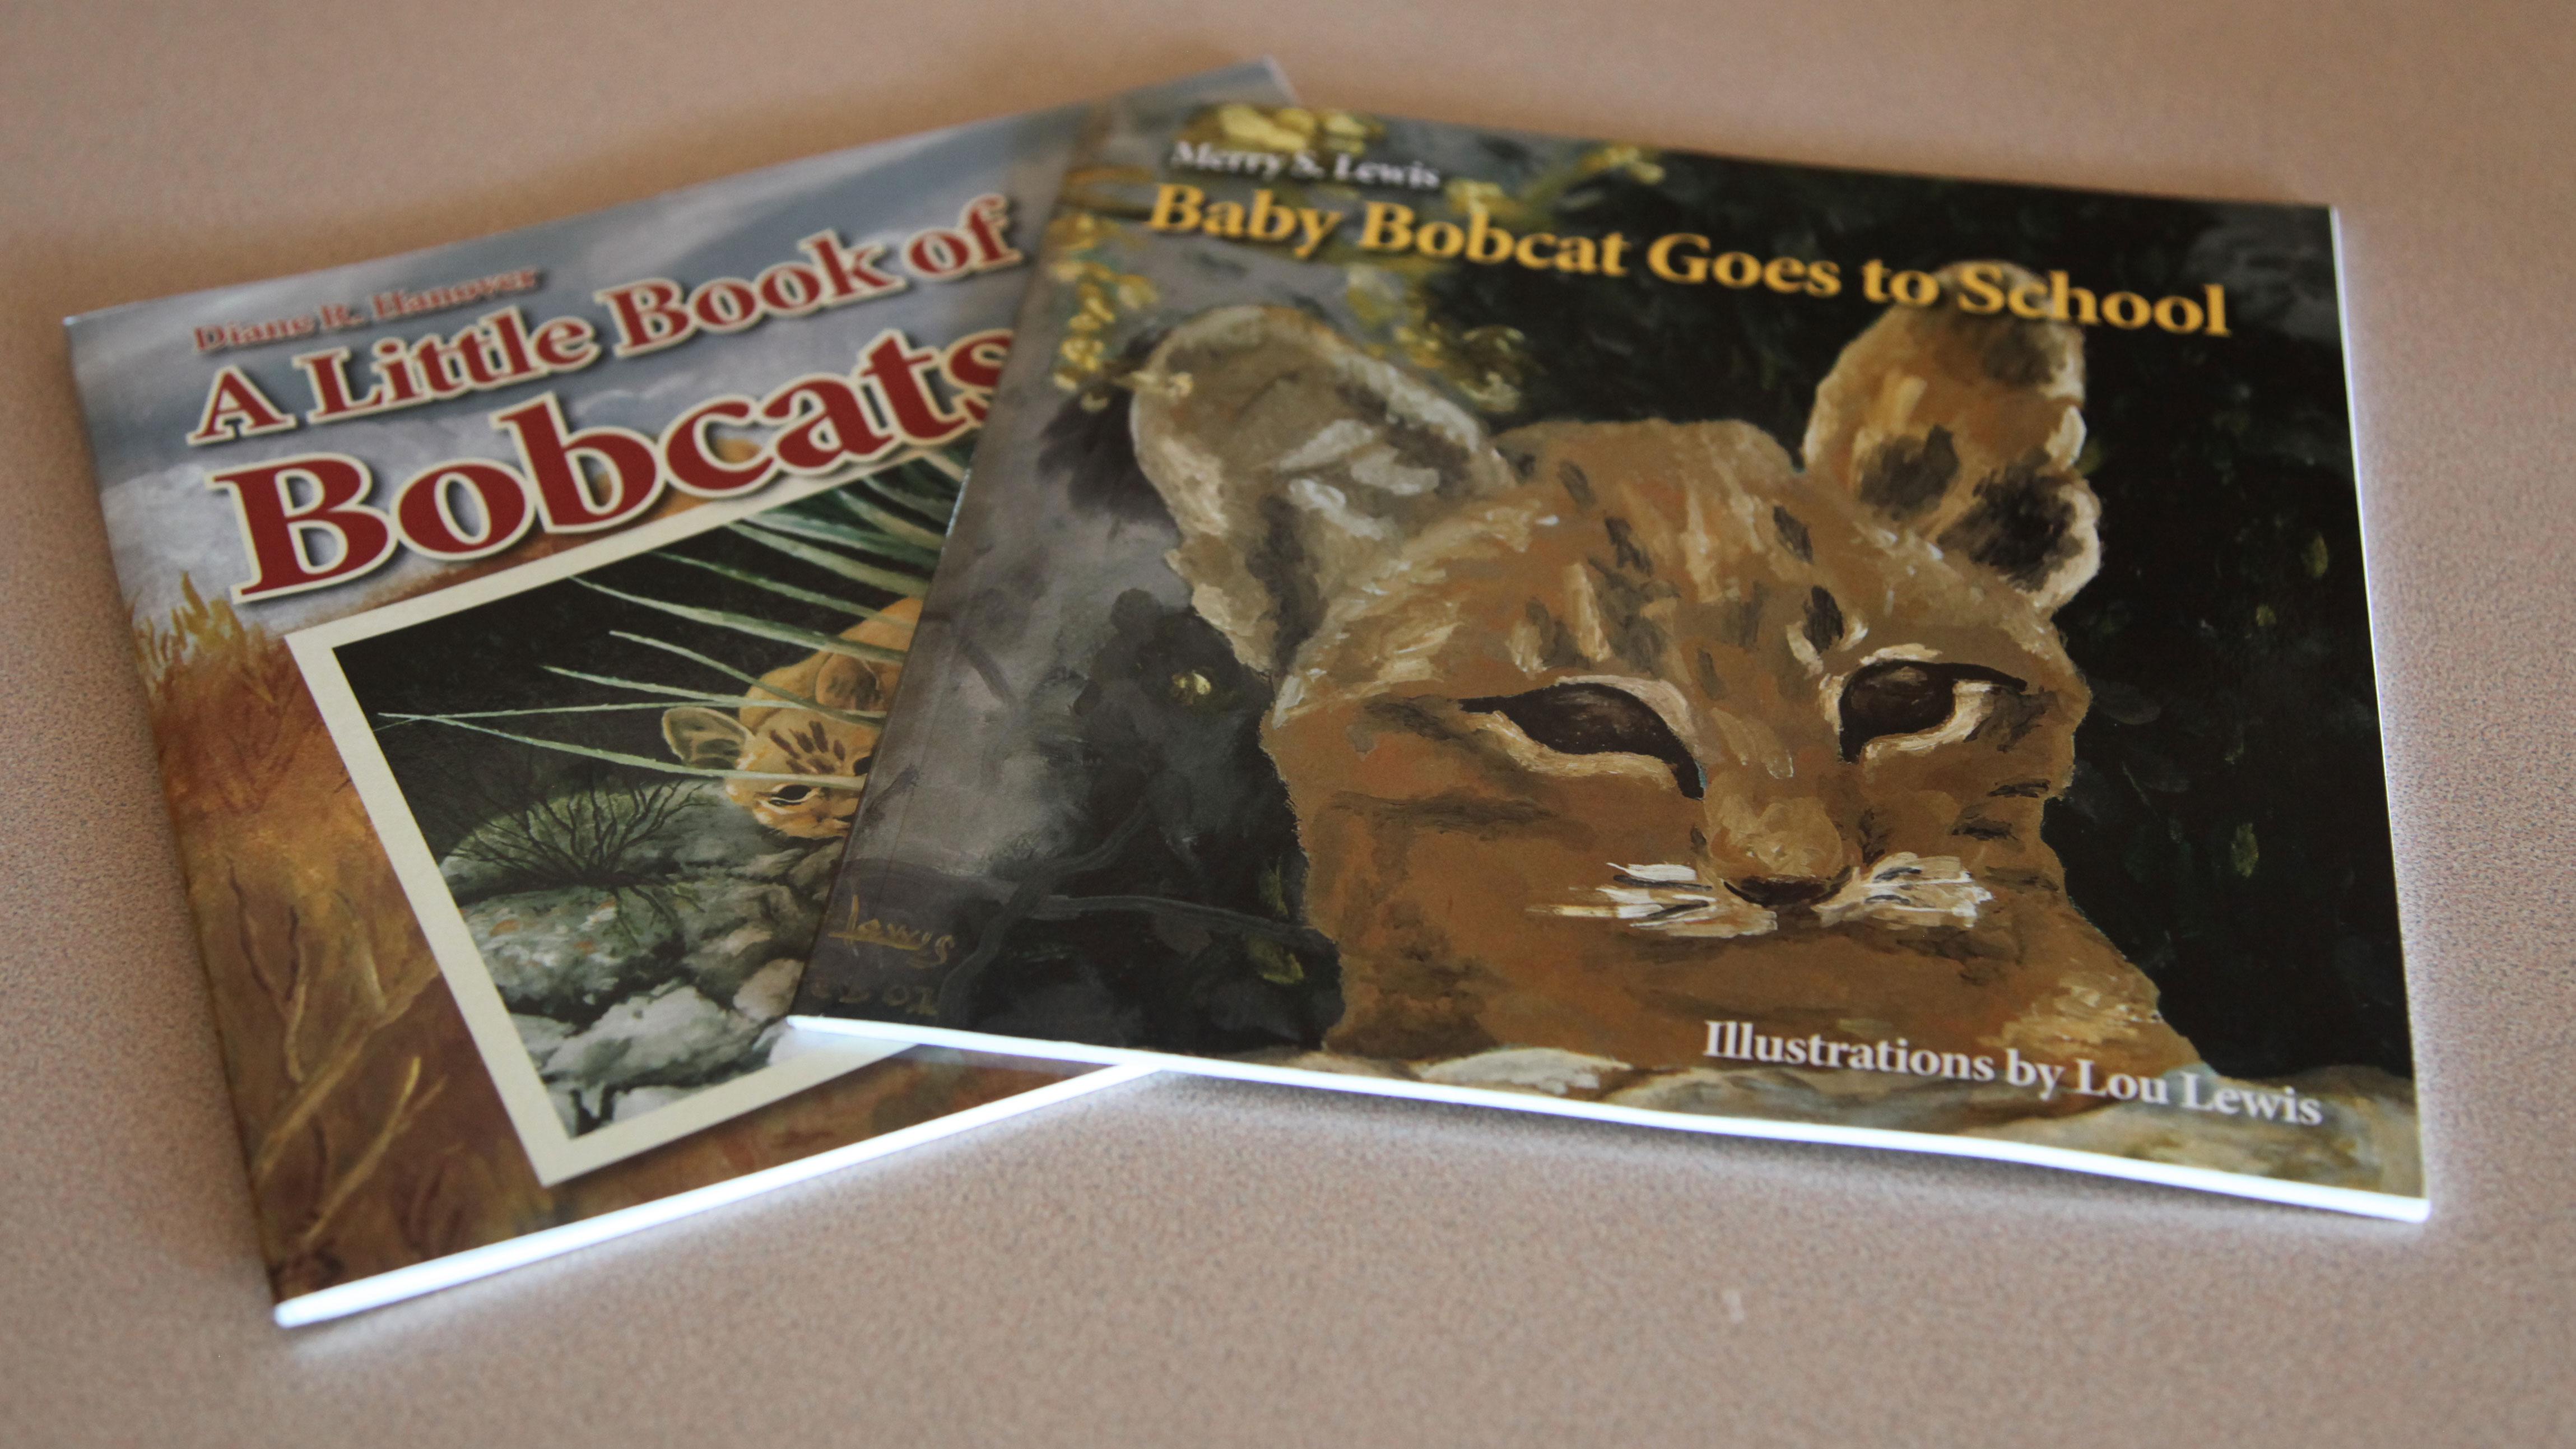 Bobcat books